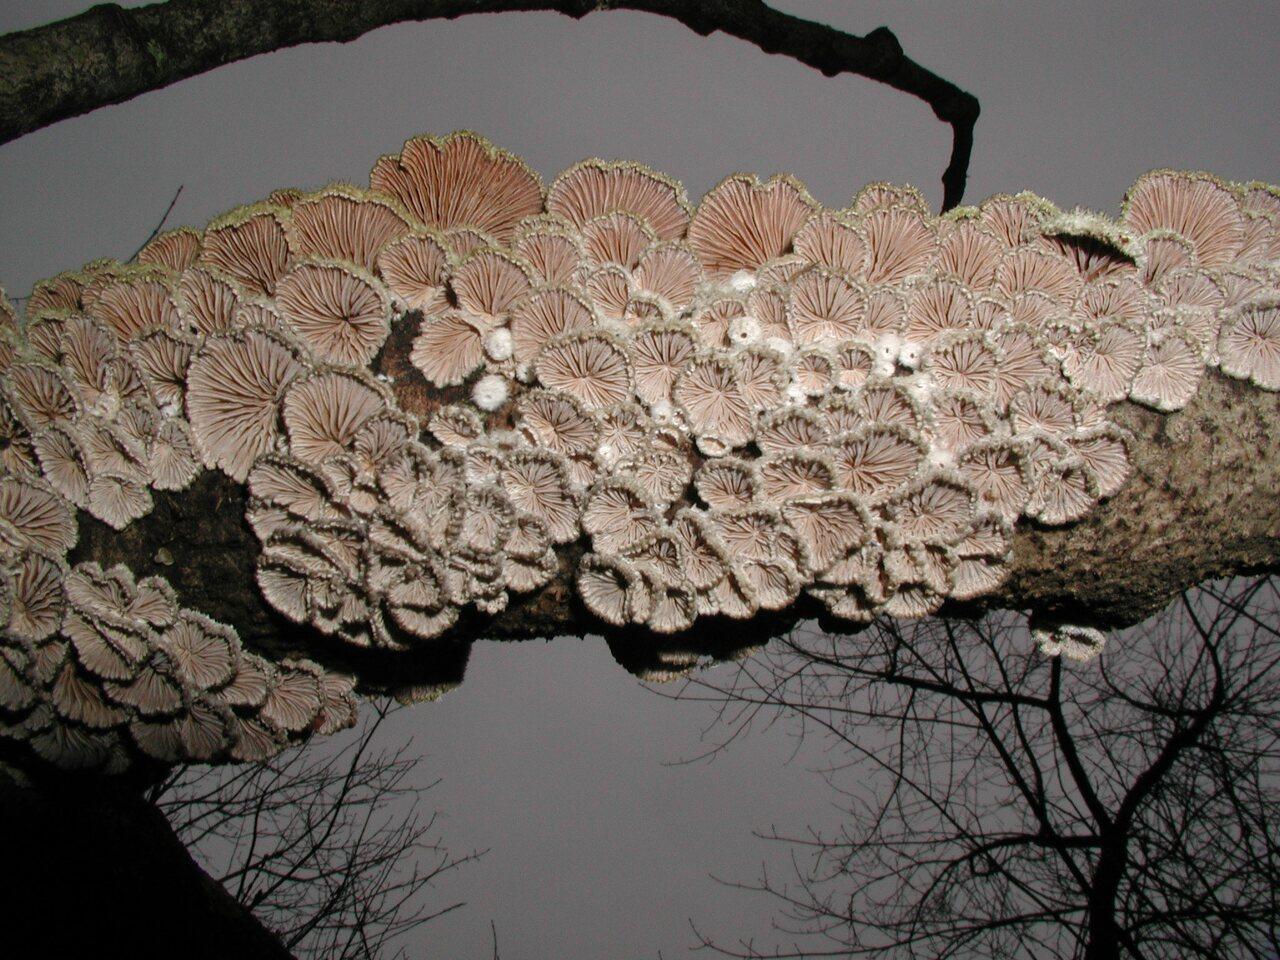 Schizophyllum-commune-PB180059.jpg